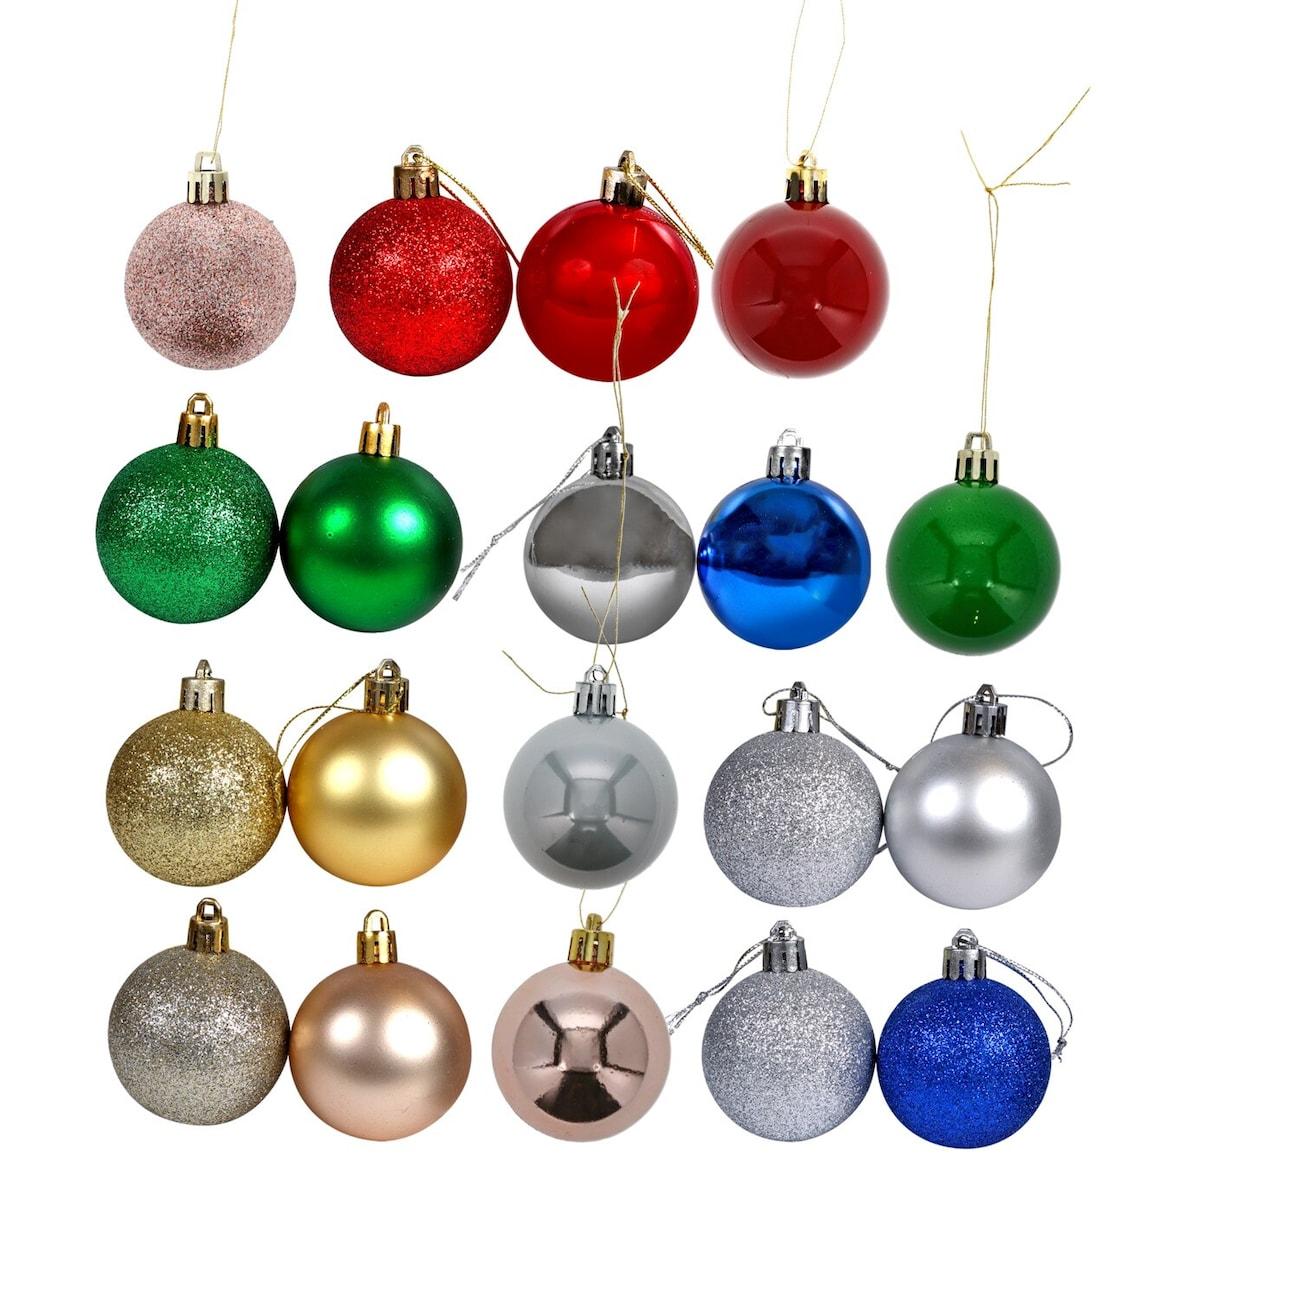 Christmas Ornaments - Dollar Tree, Inc.